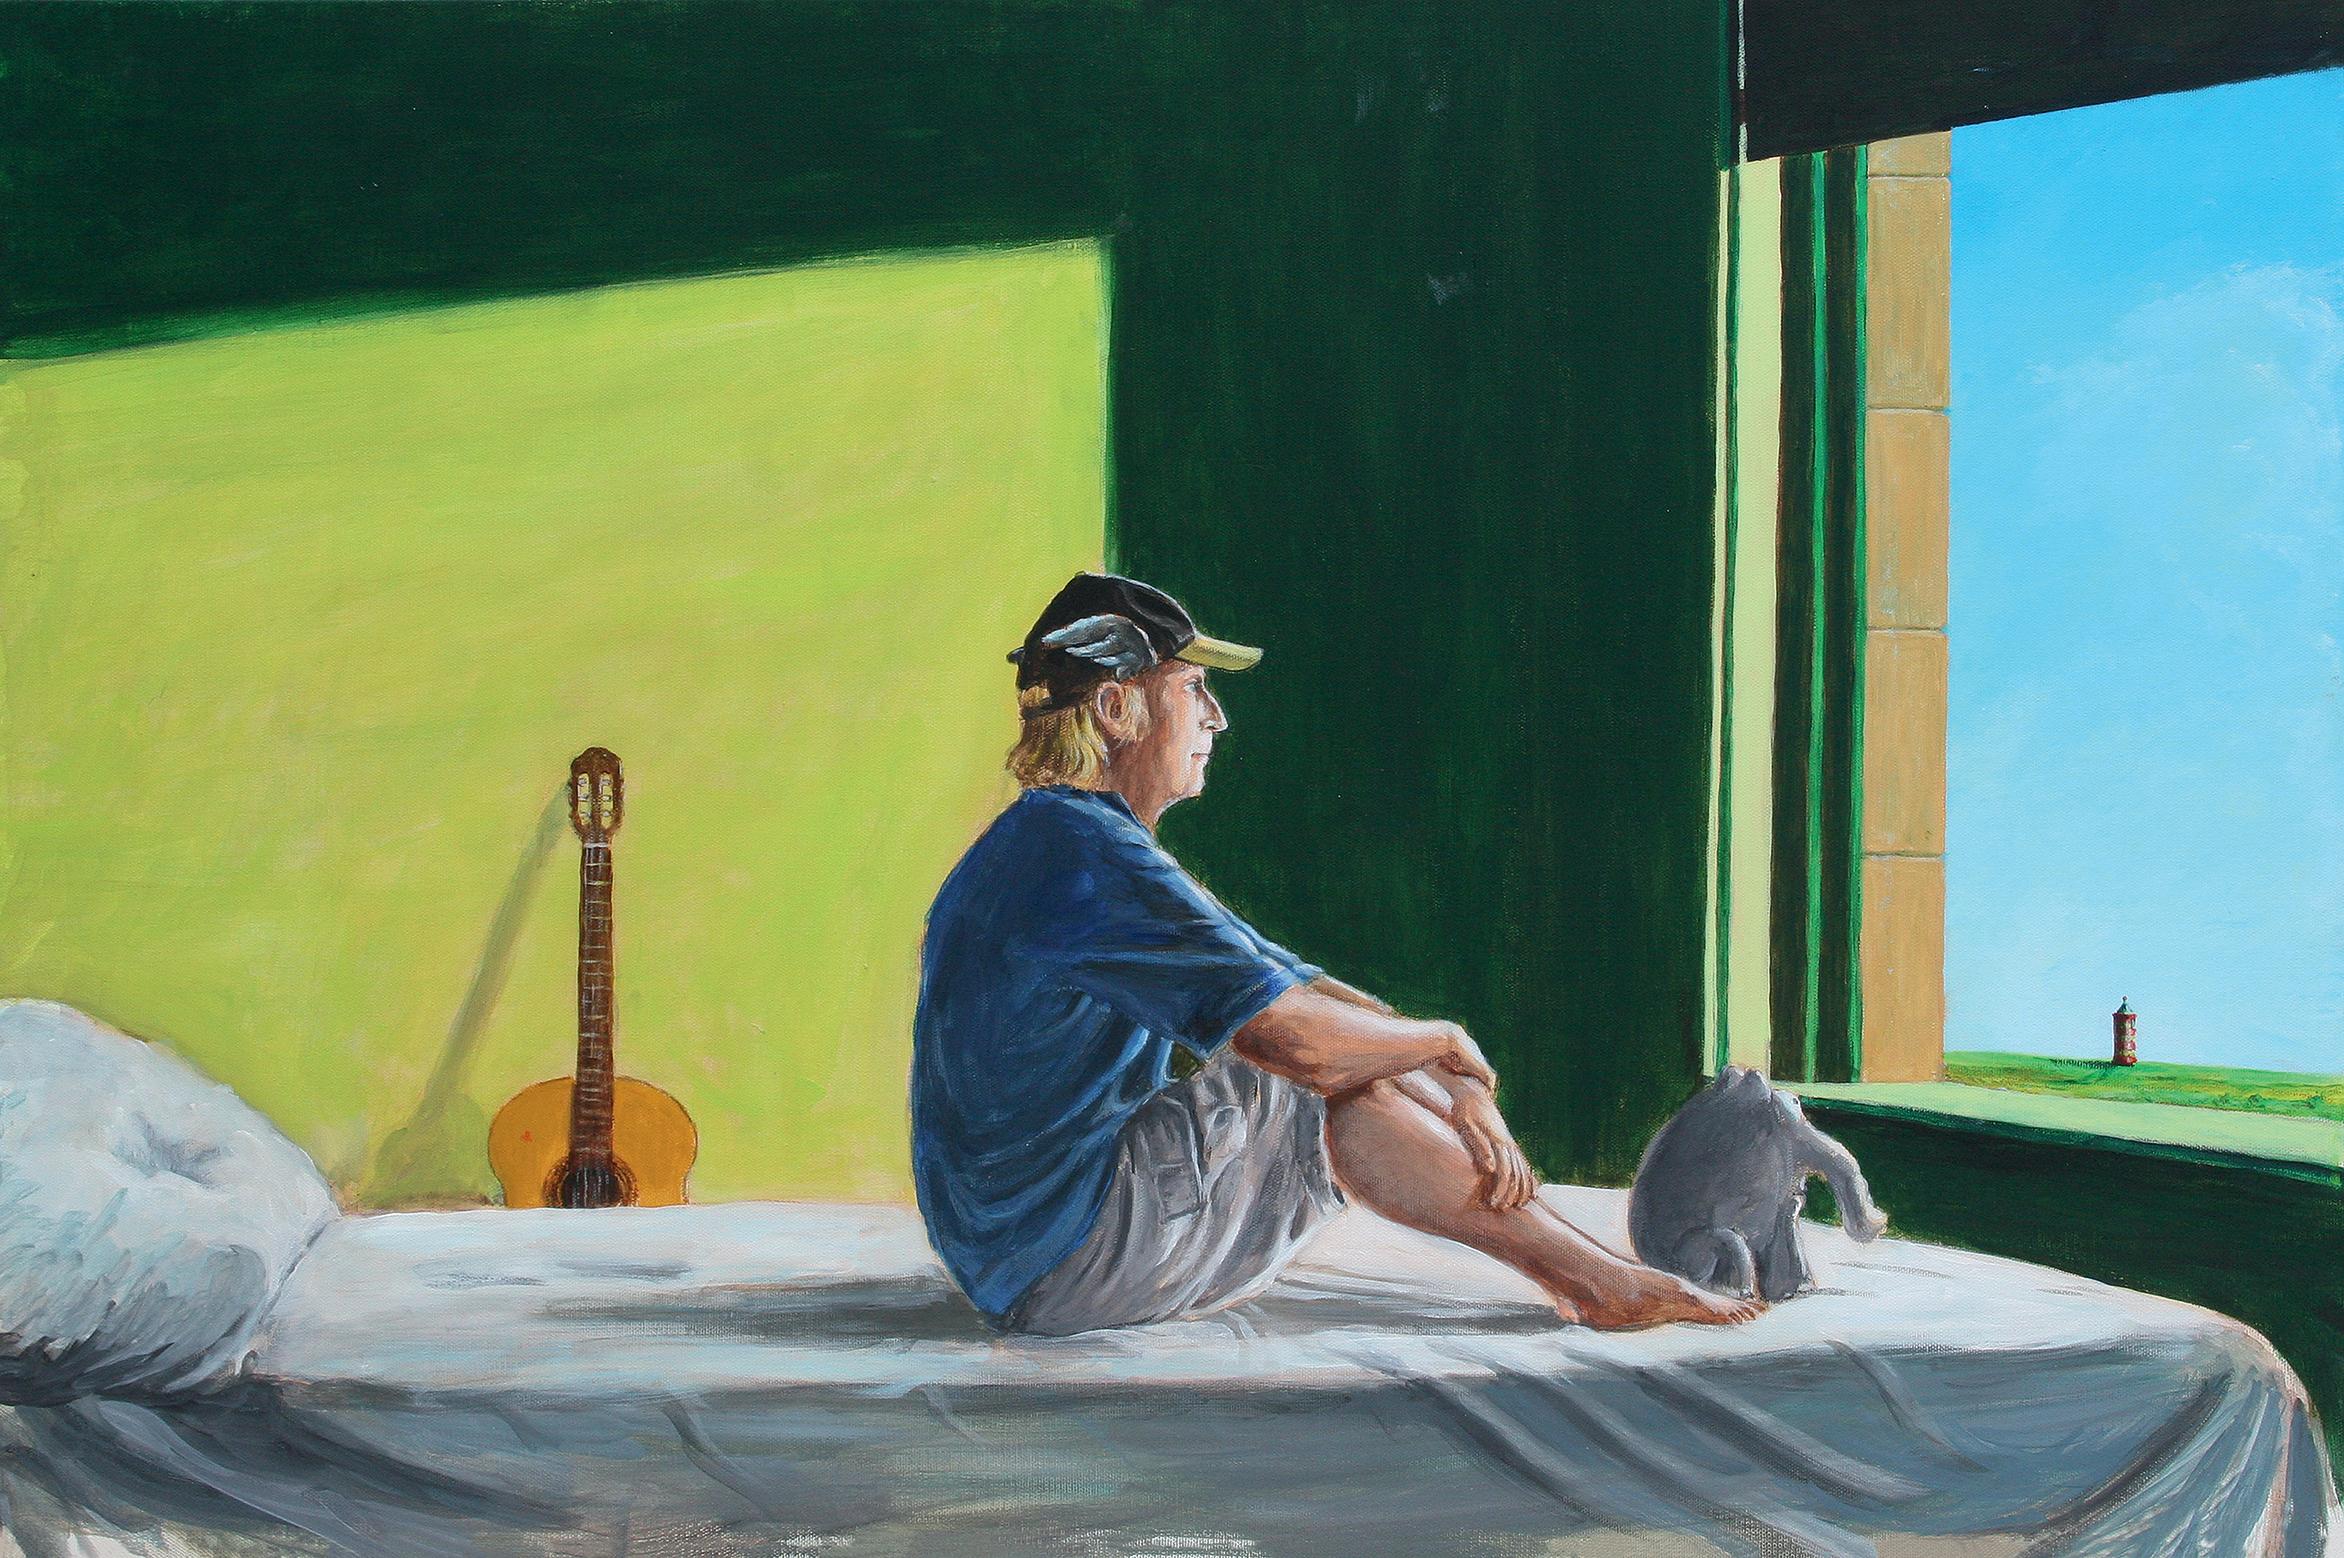 Otto Waalkes (*1948) nach Edward Hopper (1882-1967), Sitting in the Morning Sun, 2018, Acryl auf Leinwand, 60 x 90 cm, Leihgabe der Walentowski Galerien